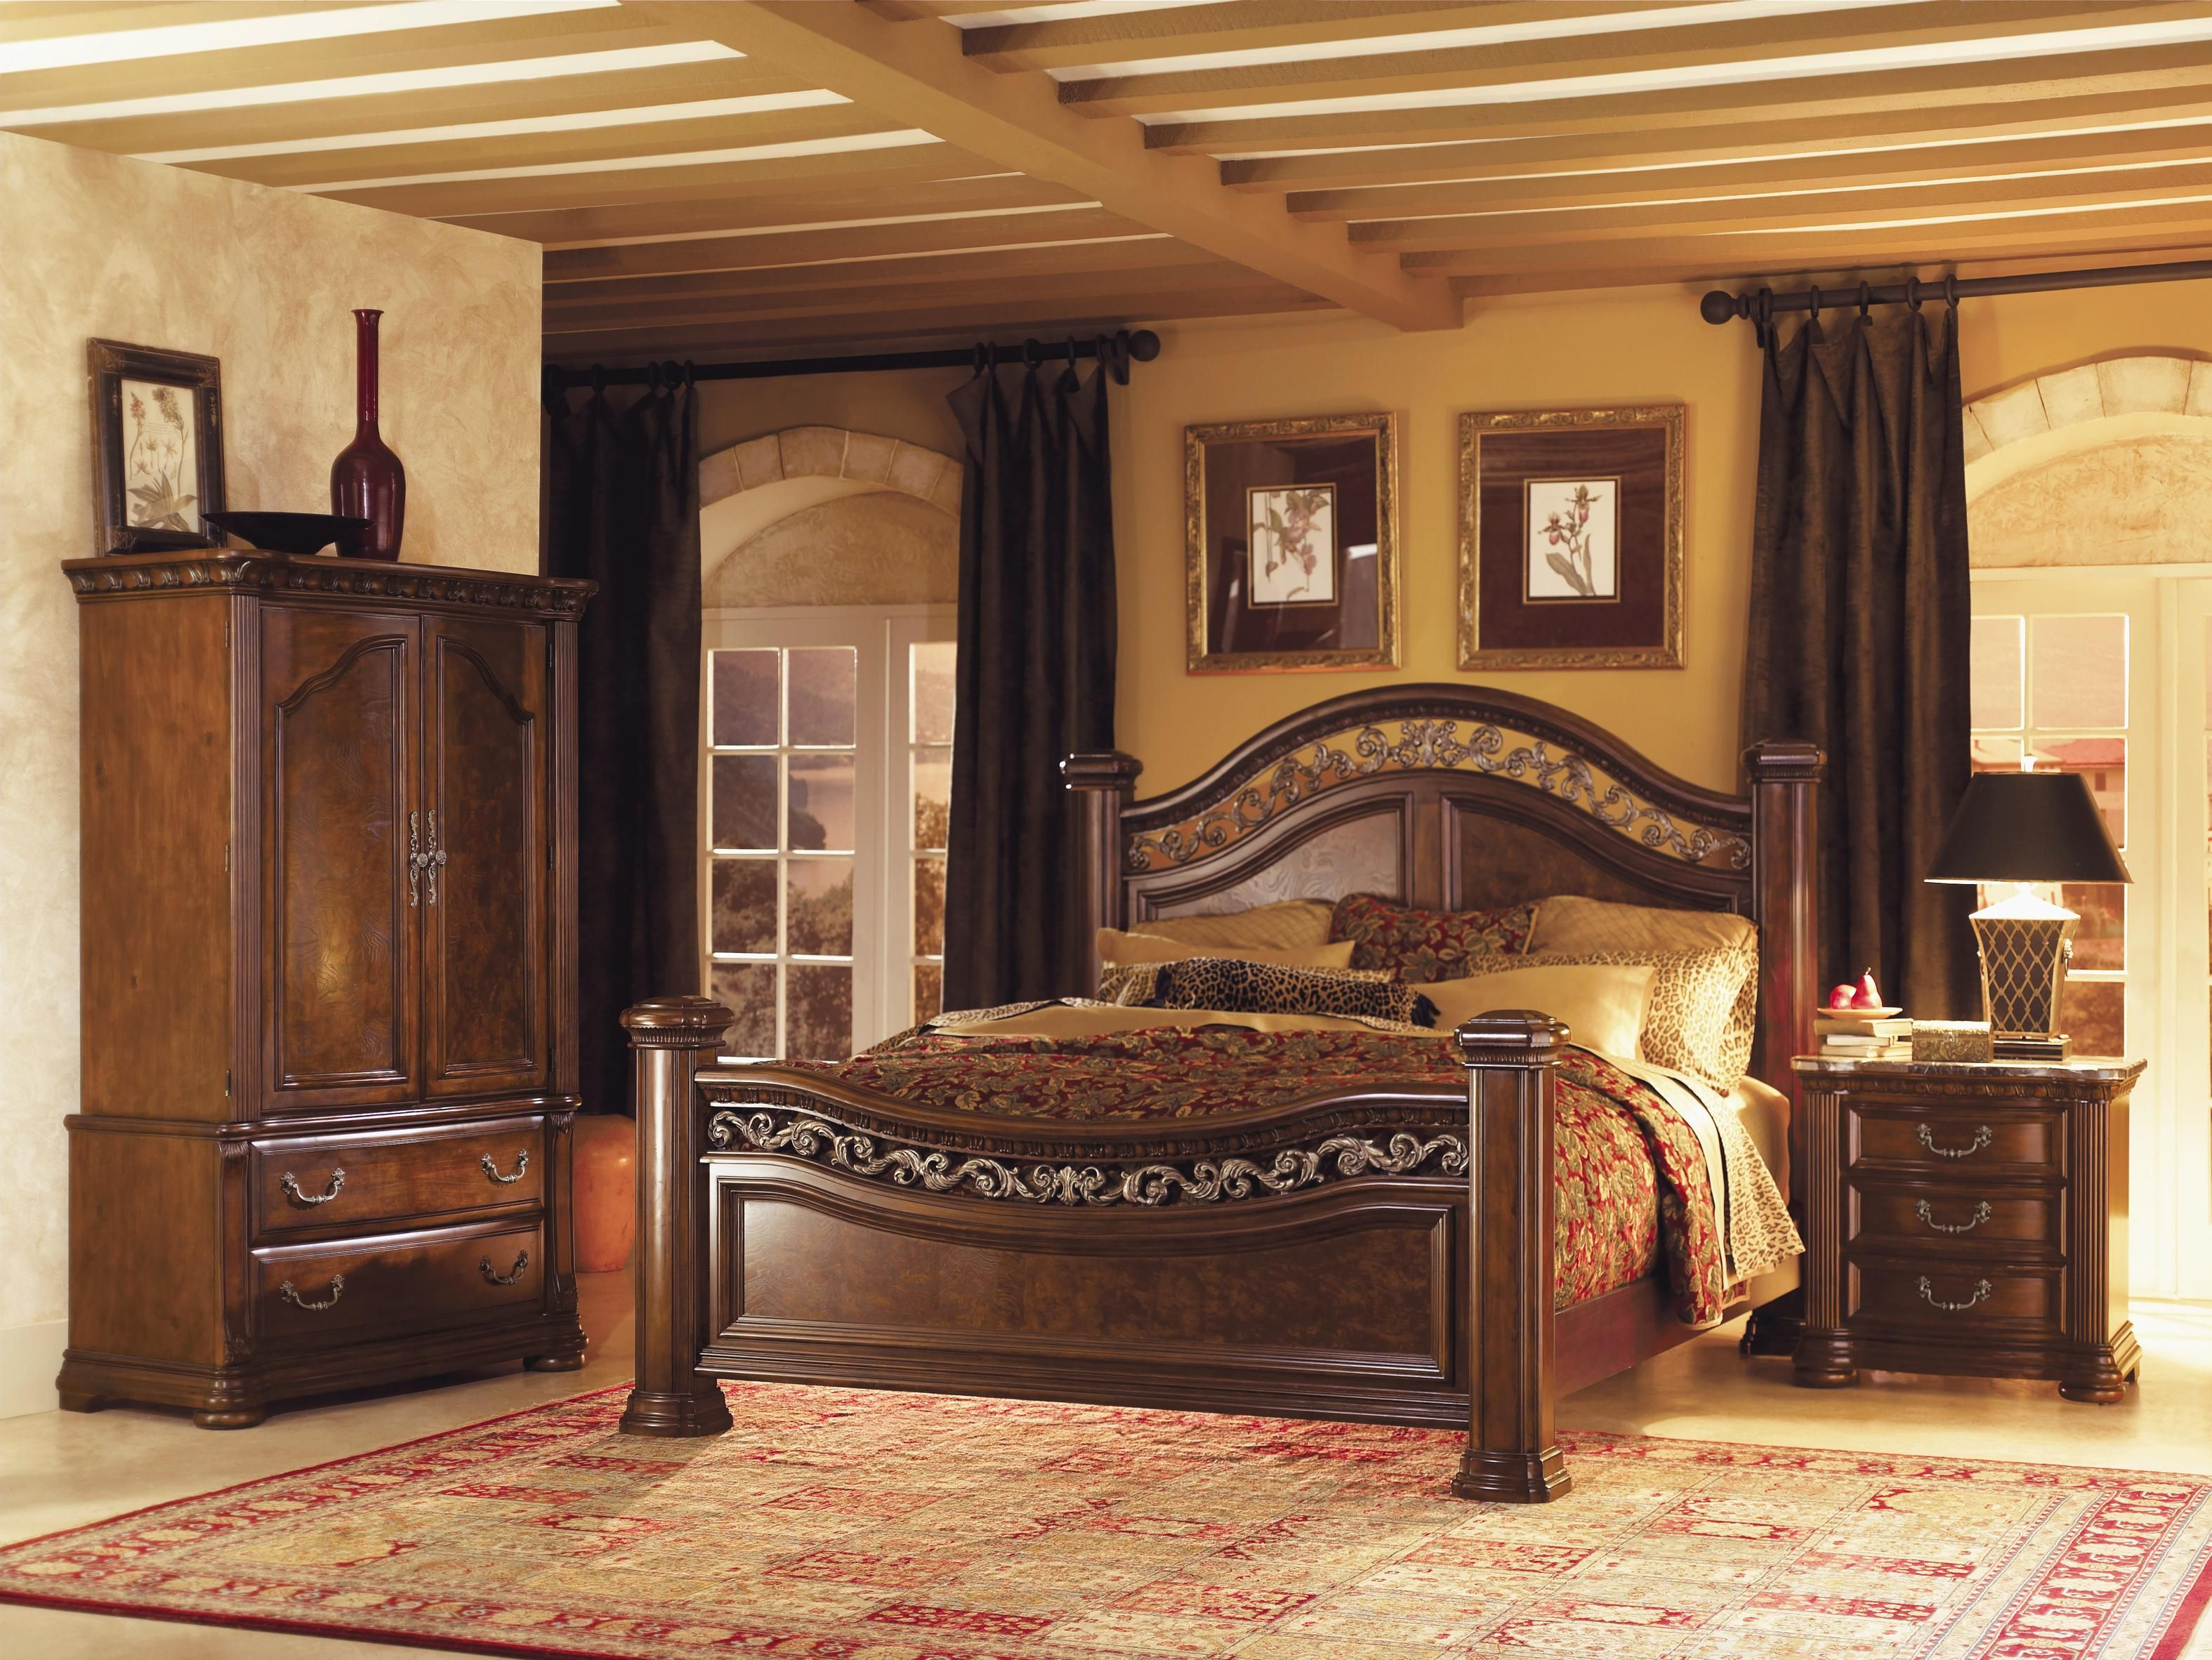 Washington S Favorite Furntiure Store Since 1955 Marlo Furniture Rockville 725 Rockville Pike Rockville Md 20 Bedroom Set Sleigh Bedroom Set Bedroom Sets